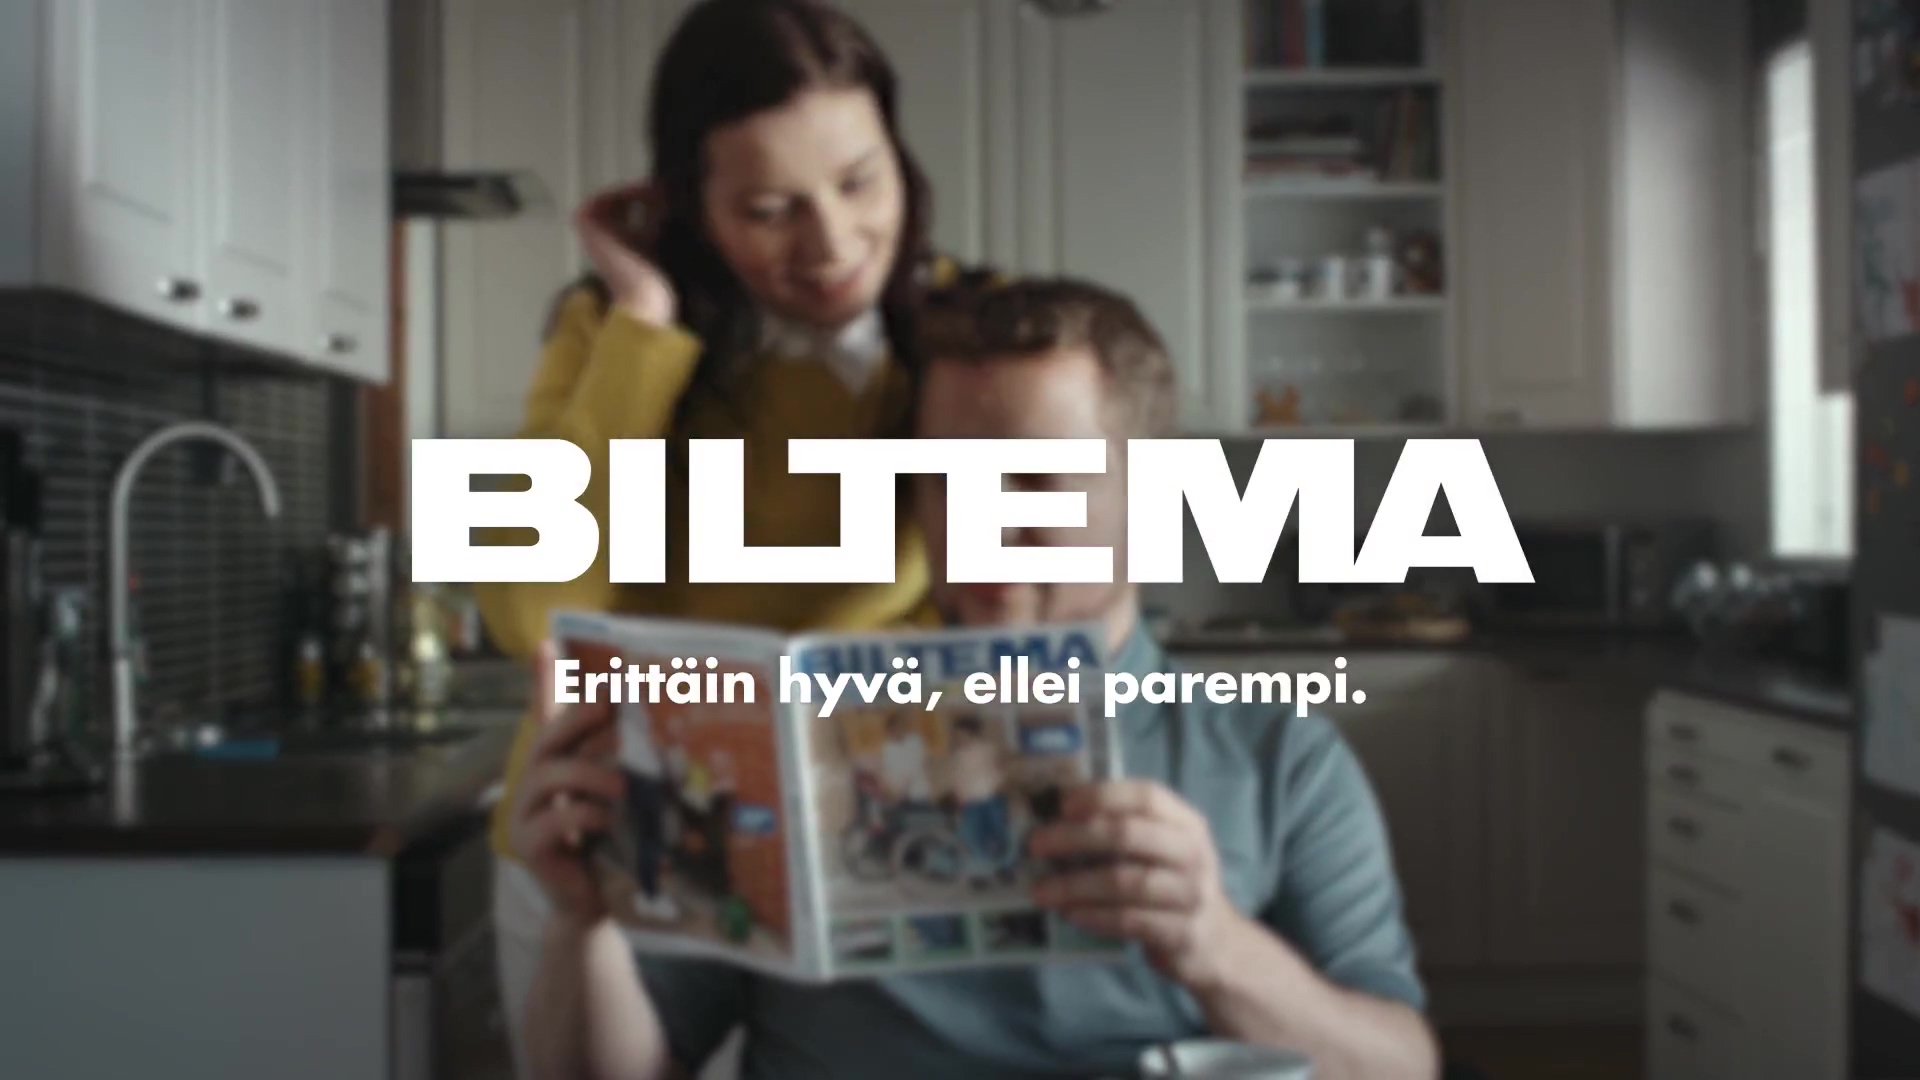 Biltema - TV-spot